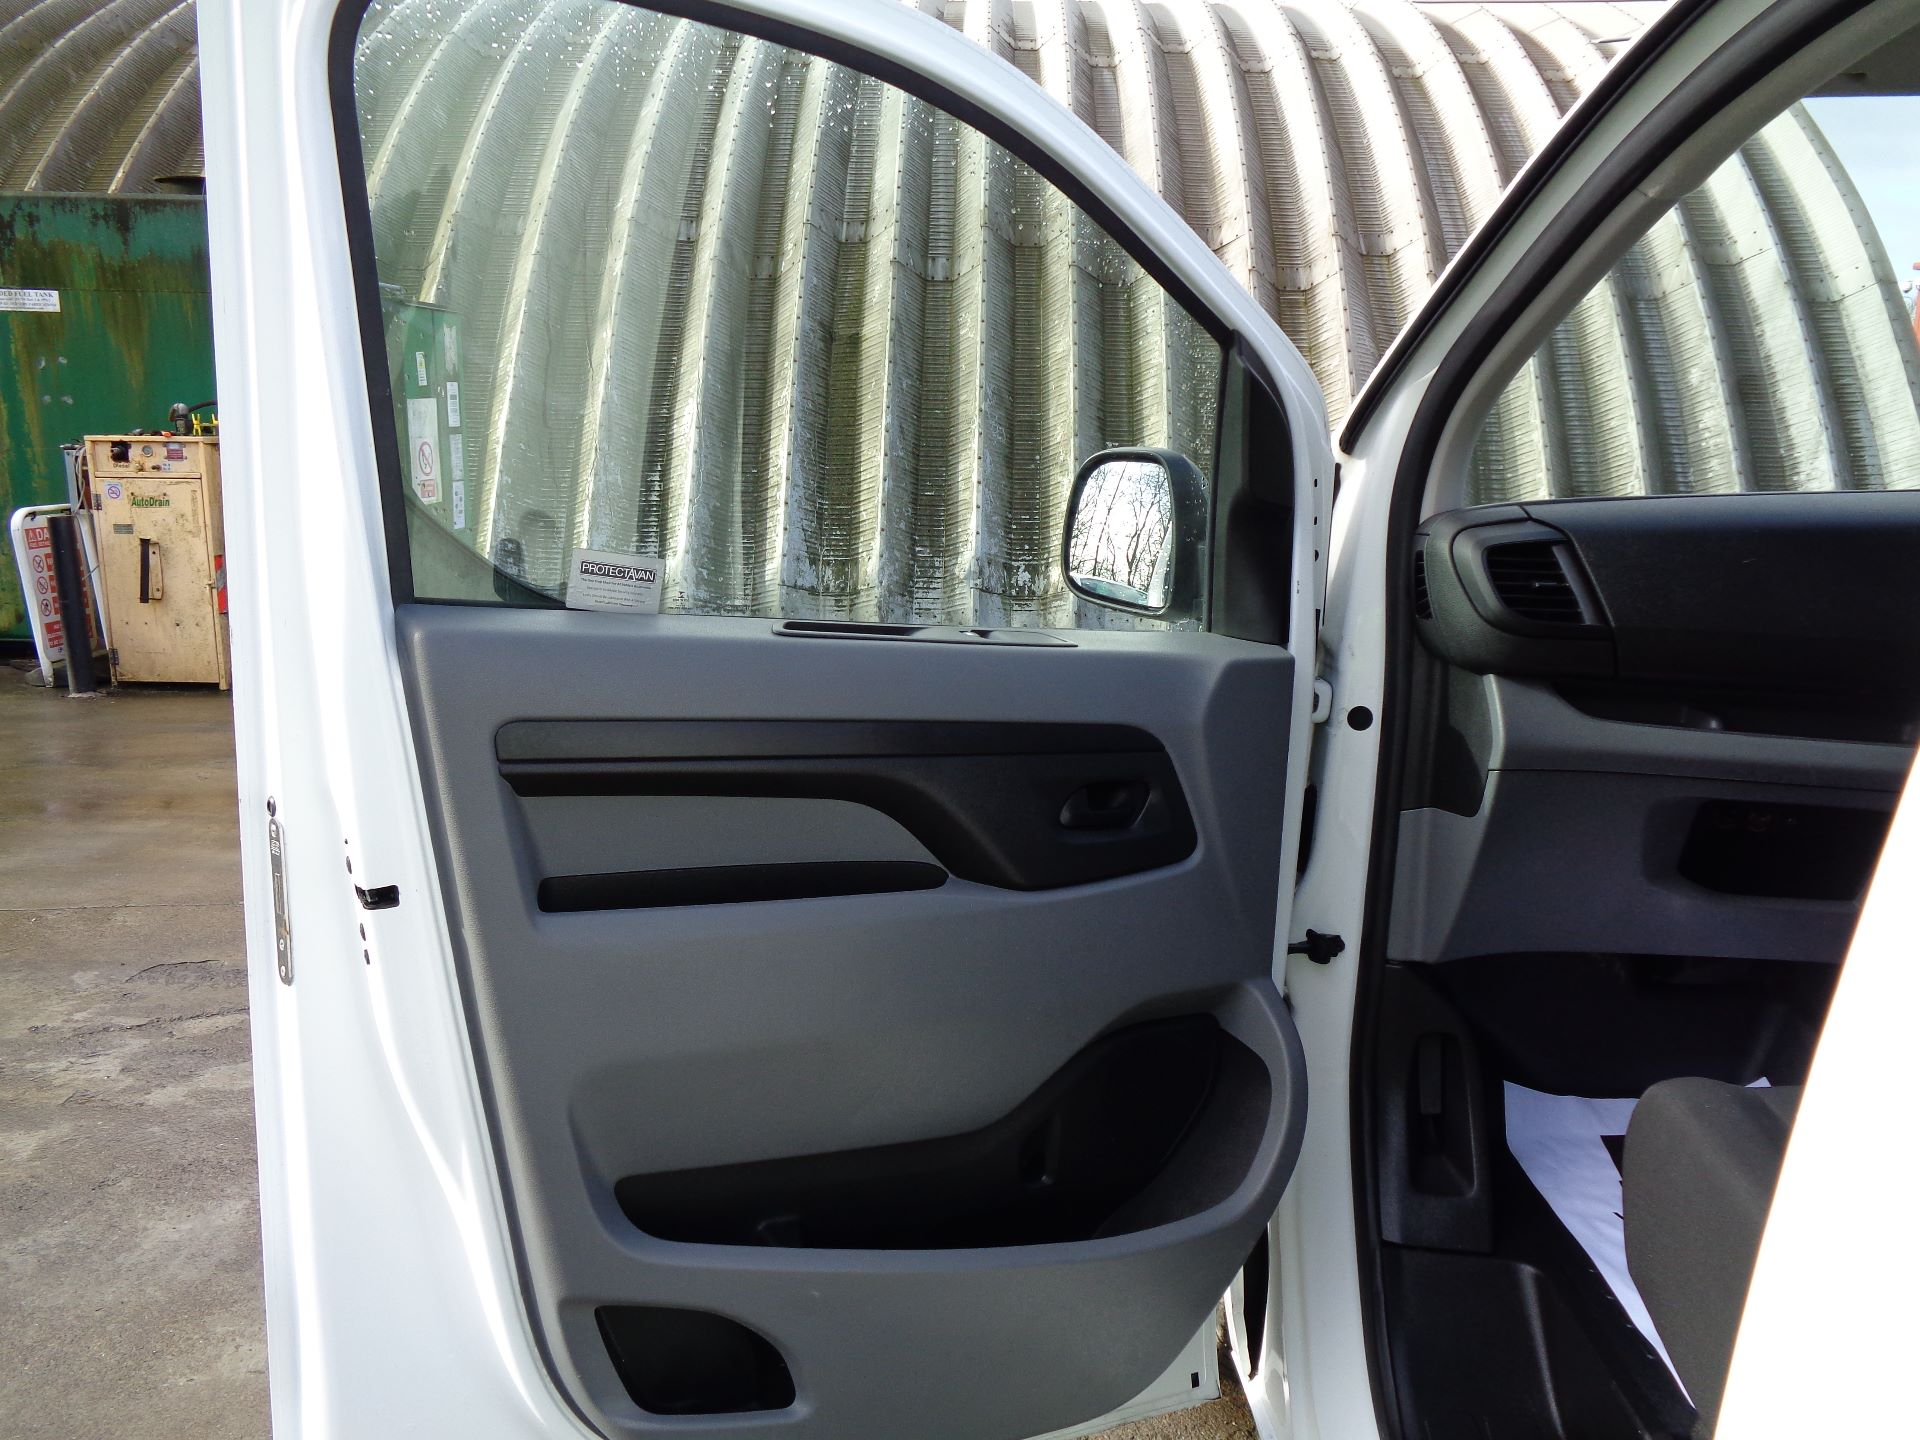 2017 Peugeot Expert  STANDARD 1000 1.6 BLUEHDI 95 S EURO 6 (NU17VPR) Image 14